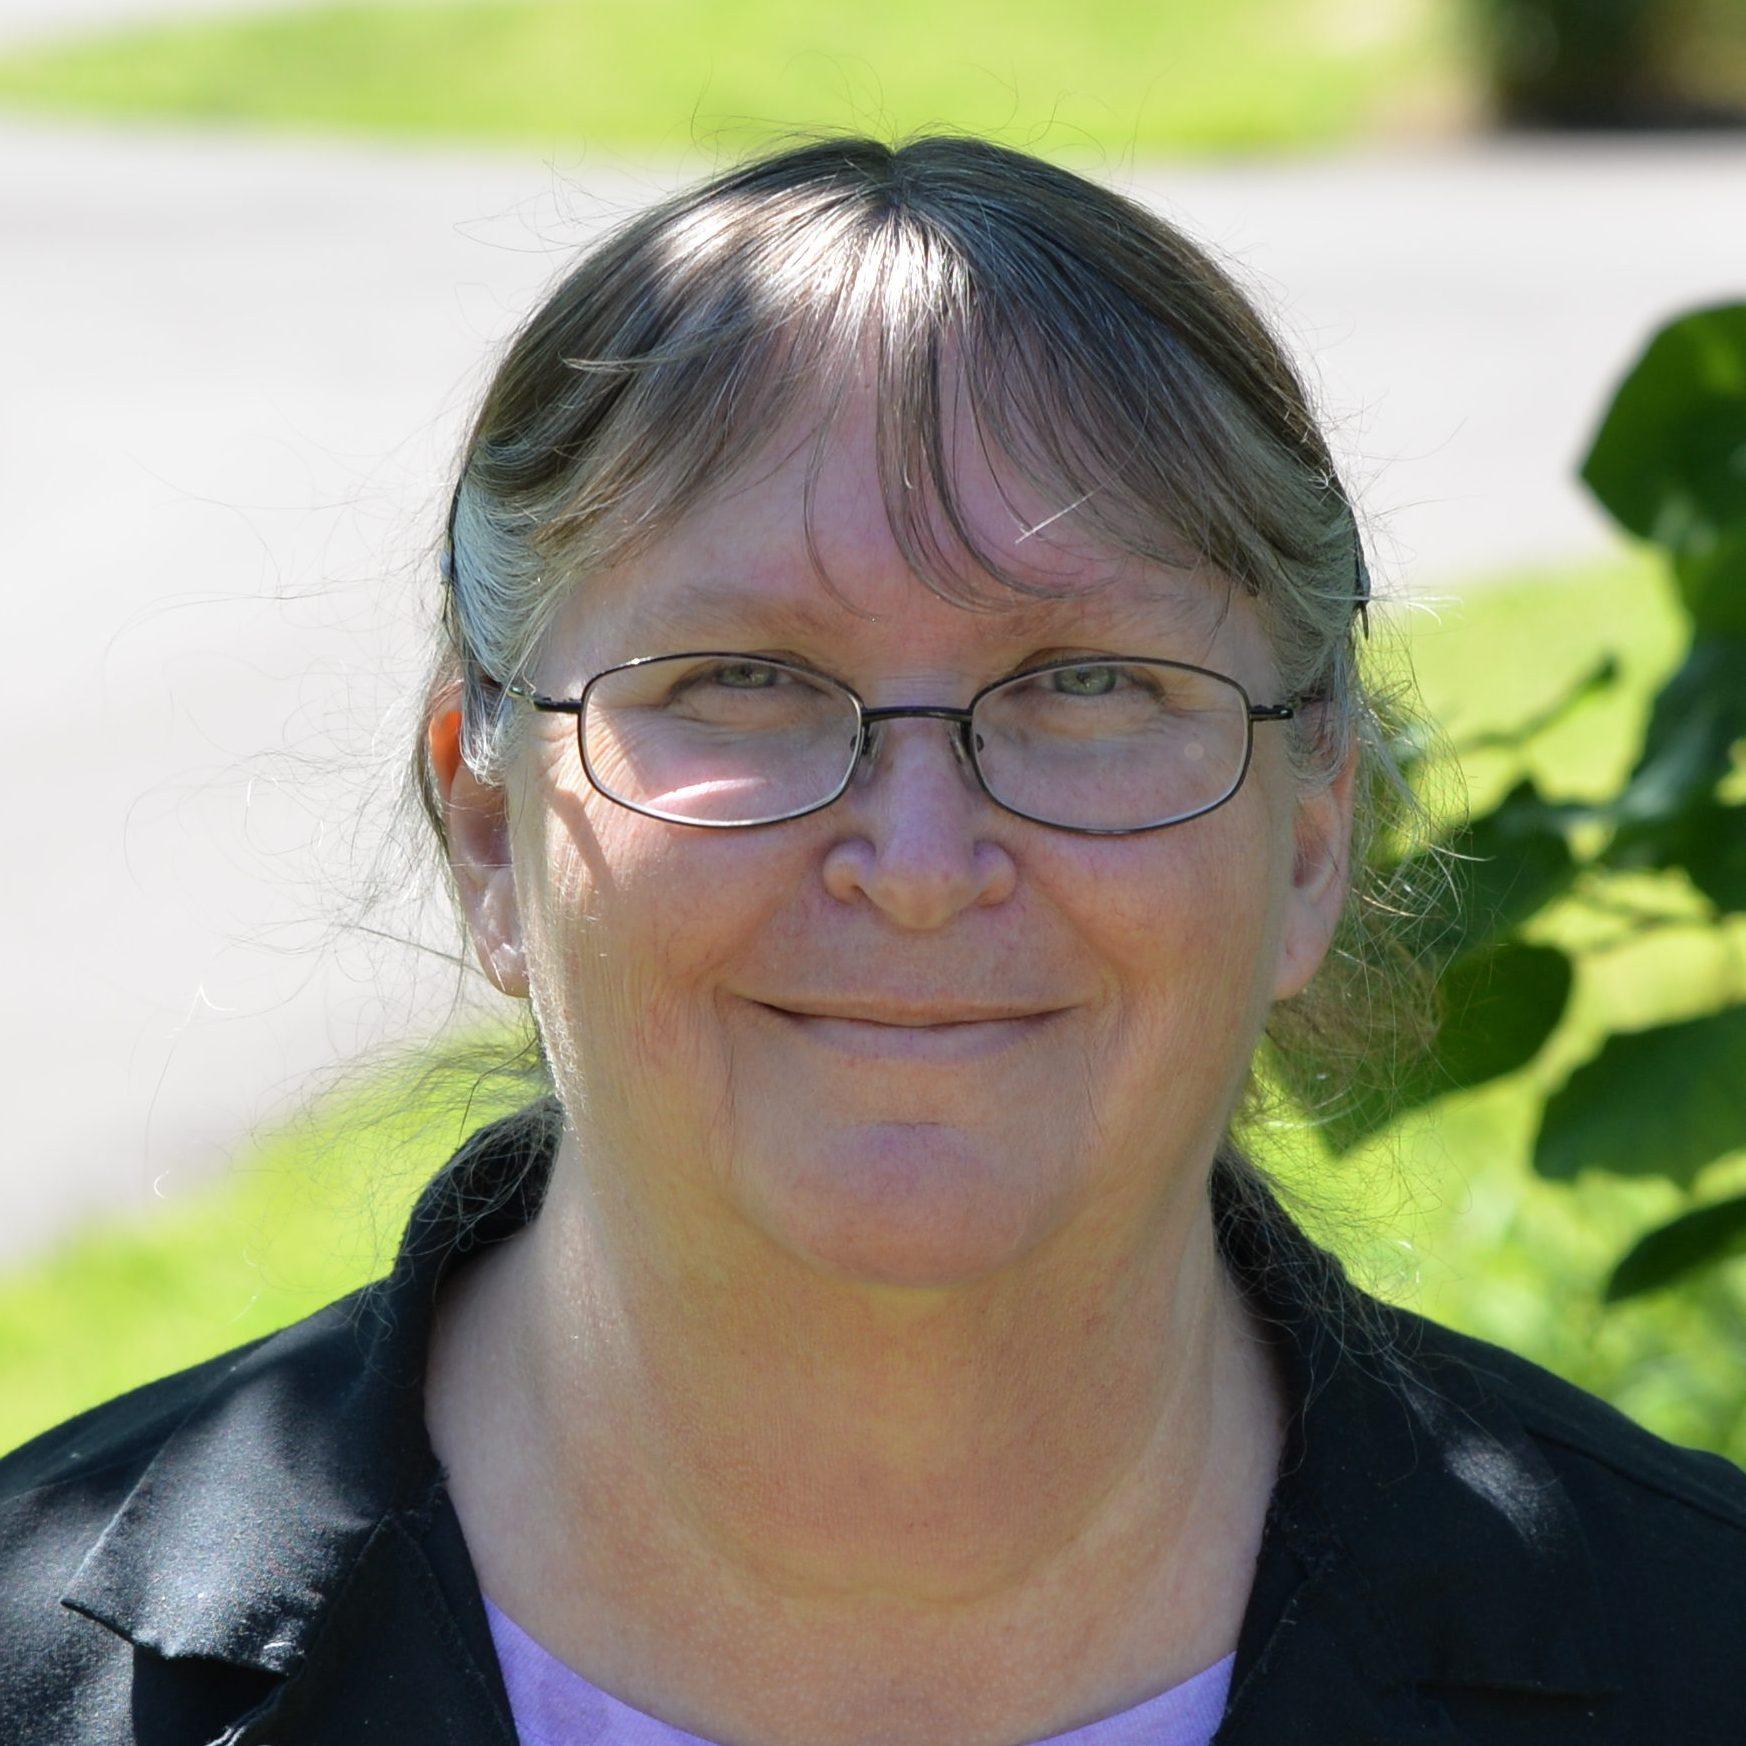 Karen Thackerson